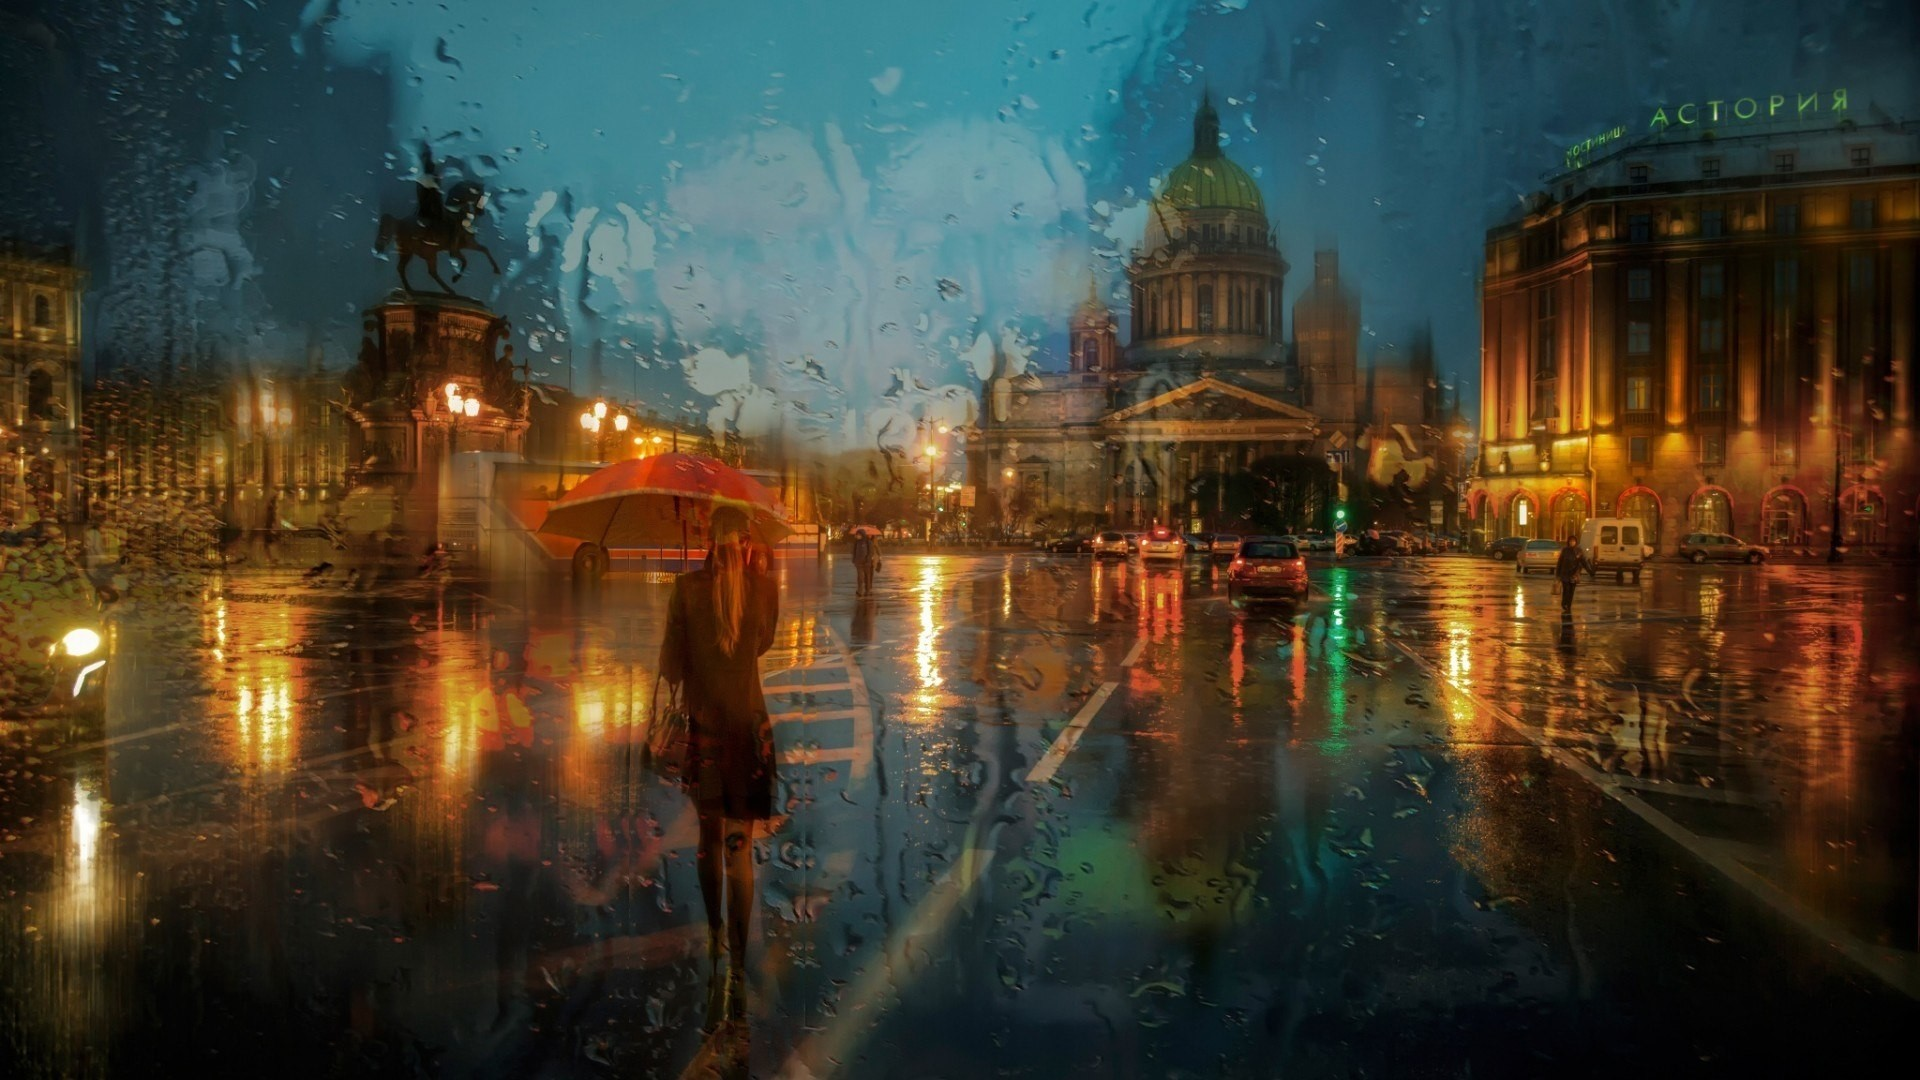 Rain Art Image